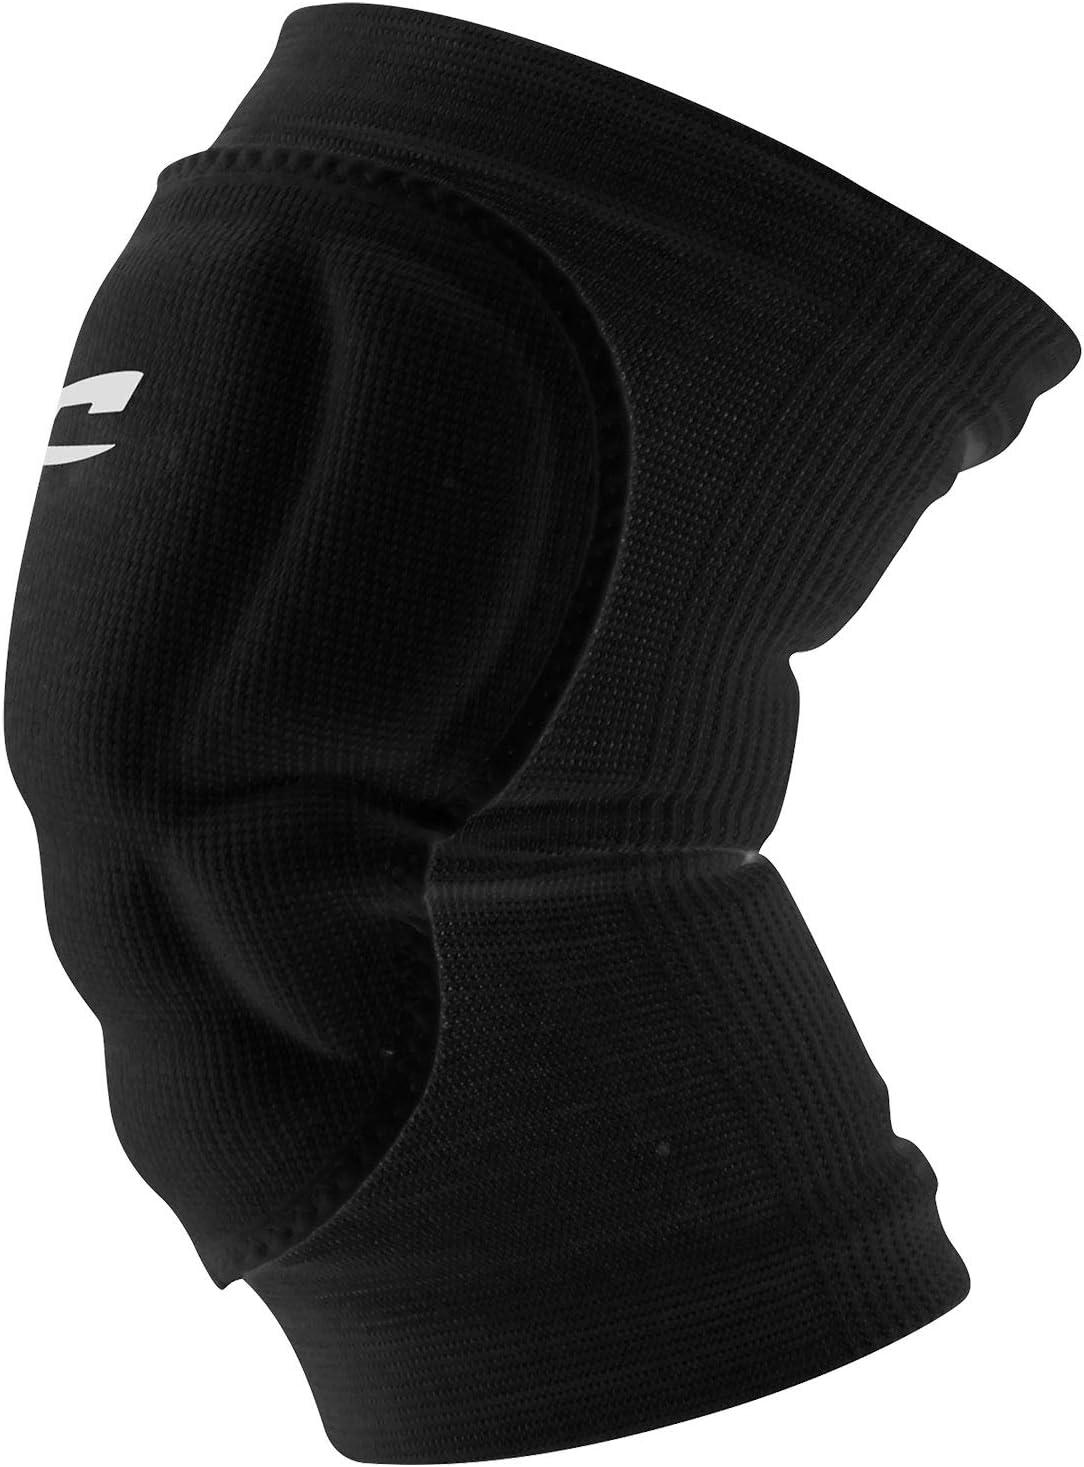 Black unisex-adult Champro Sports Arm Sleeve with Elbow Padding Youth